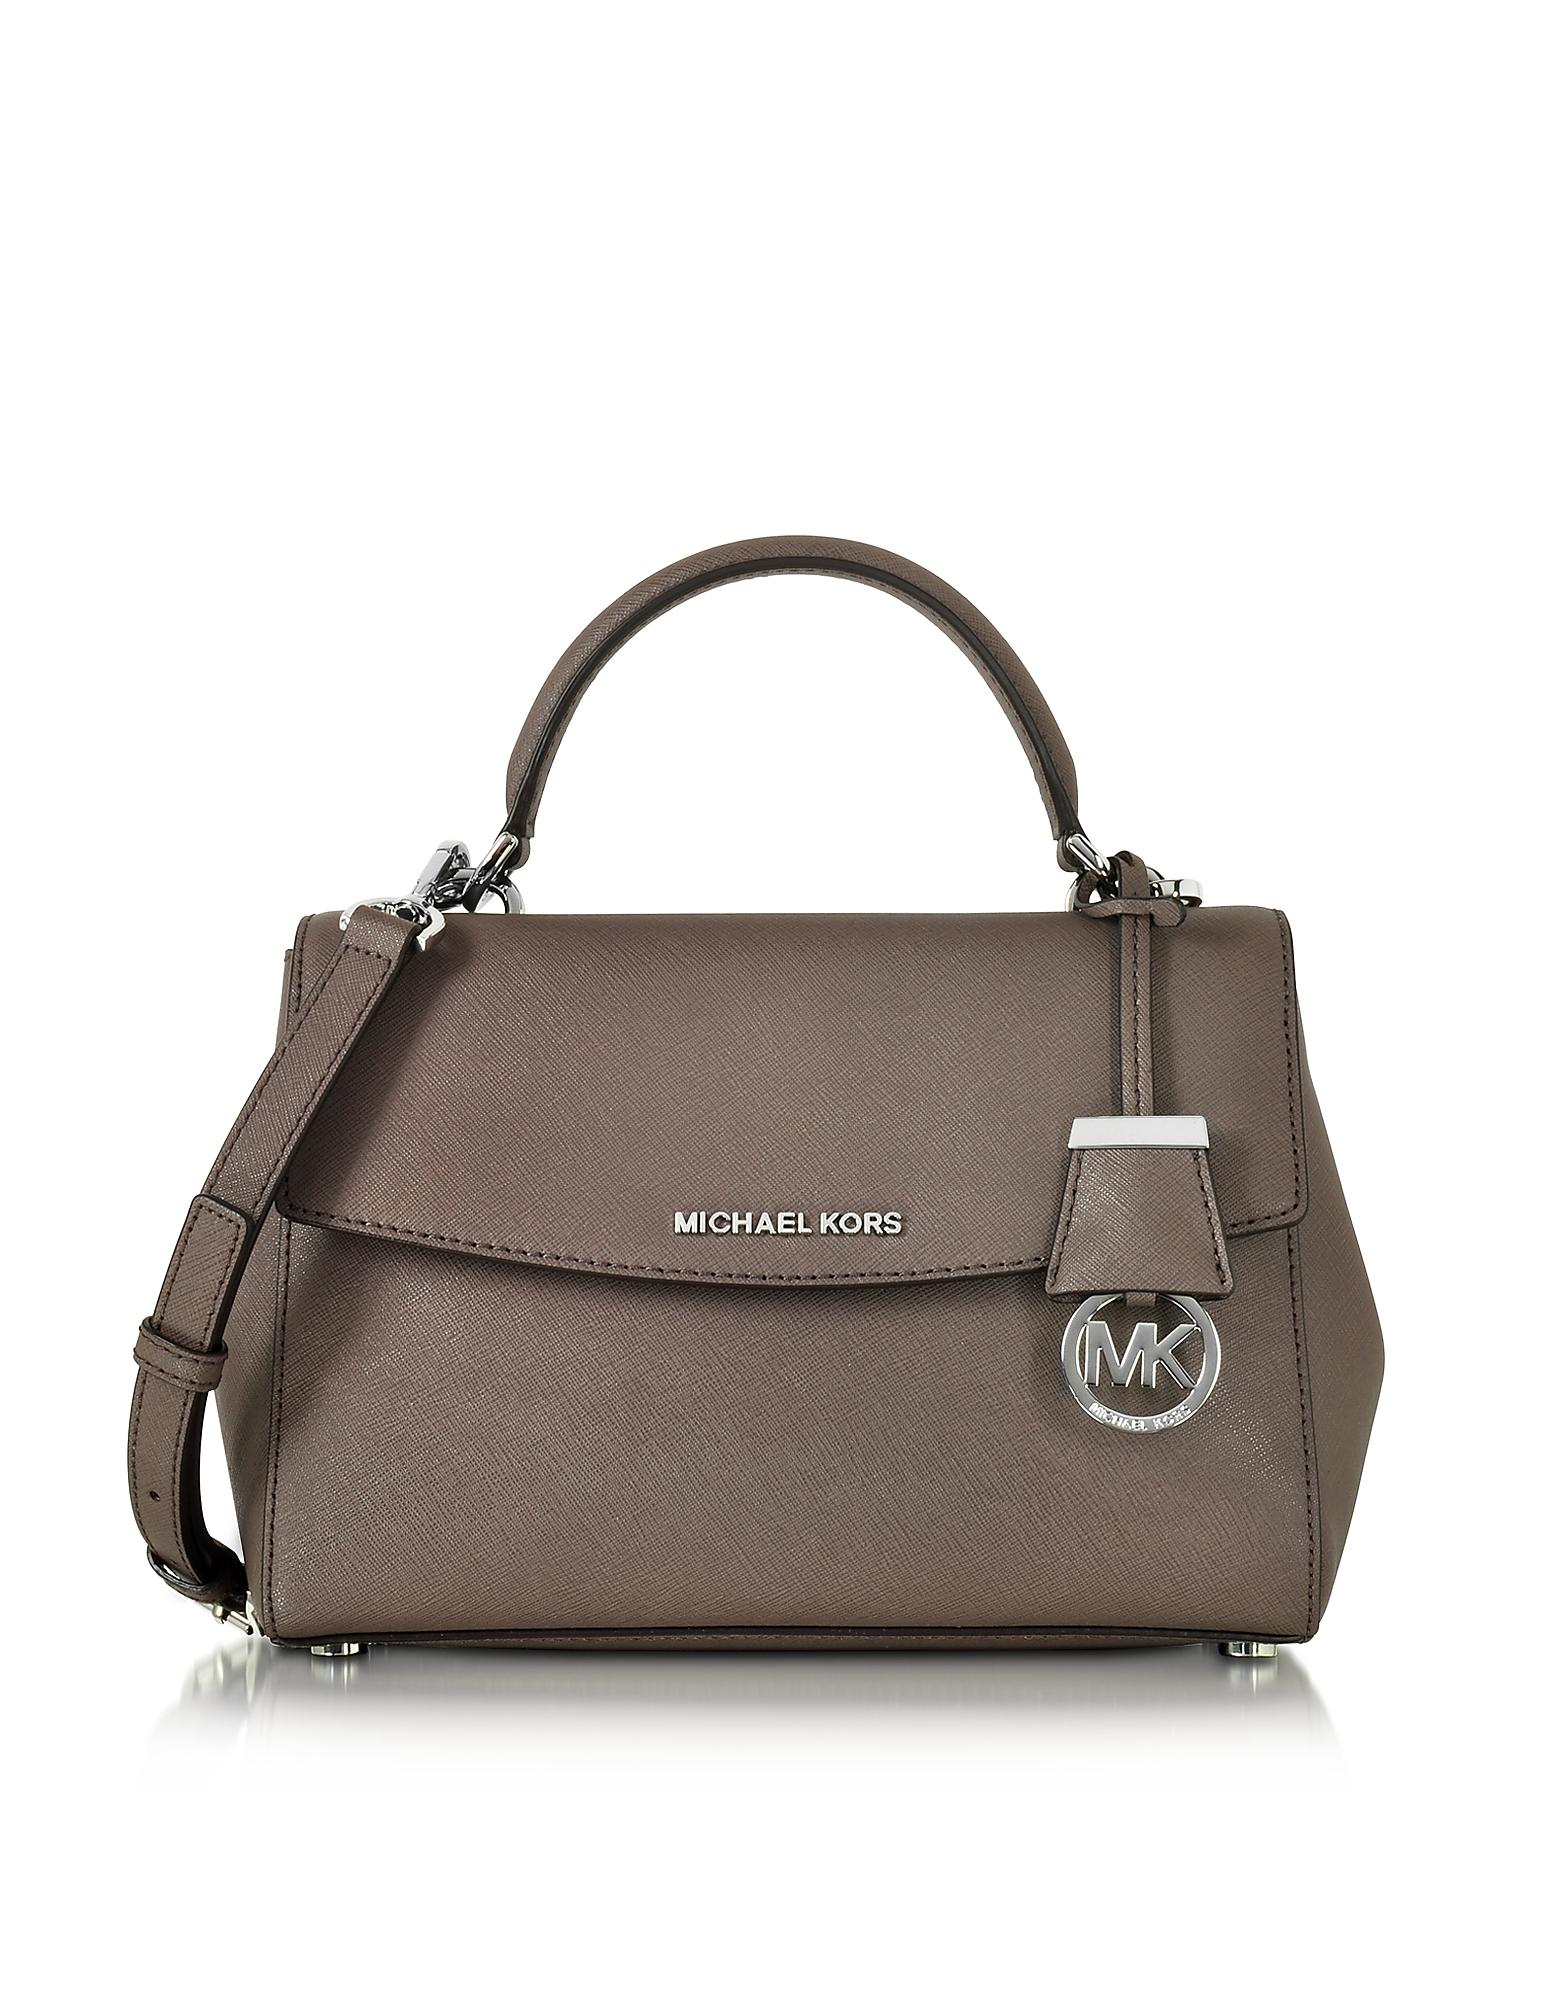 239ebc6a56bb Lyst - Michael Kors Ava Small Cinder Saffiano Leather Satchel Bag in ...